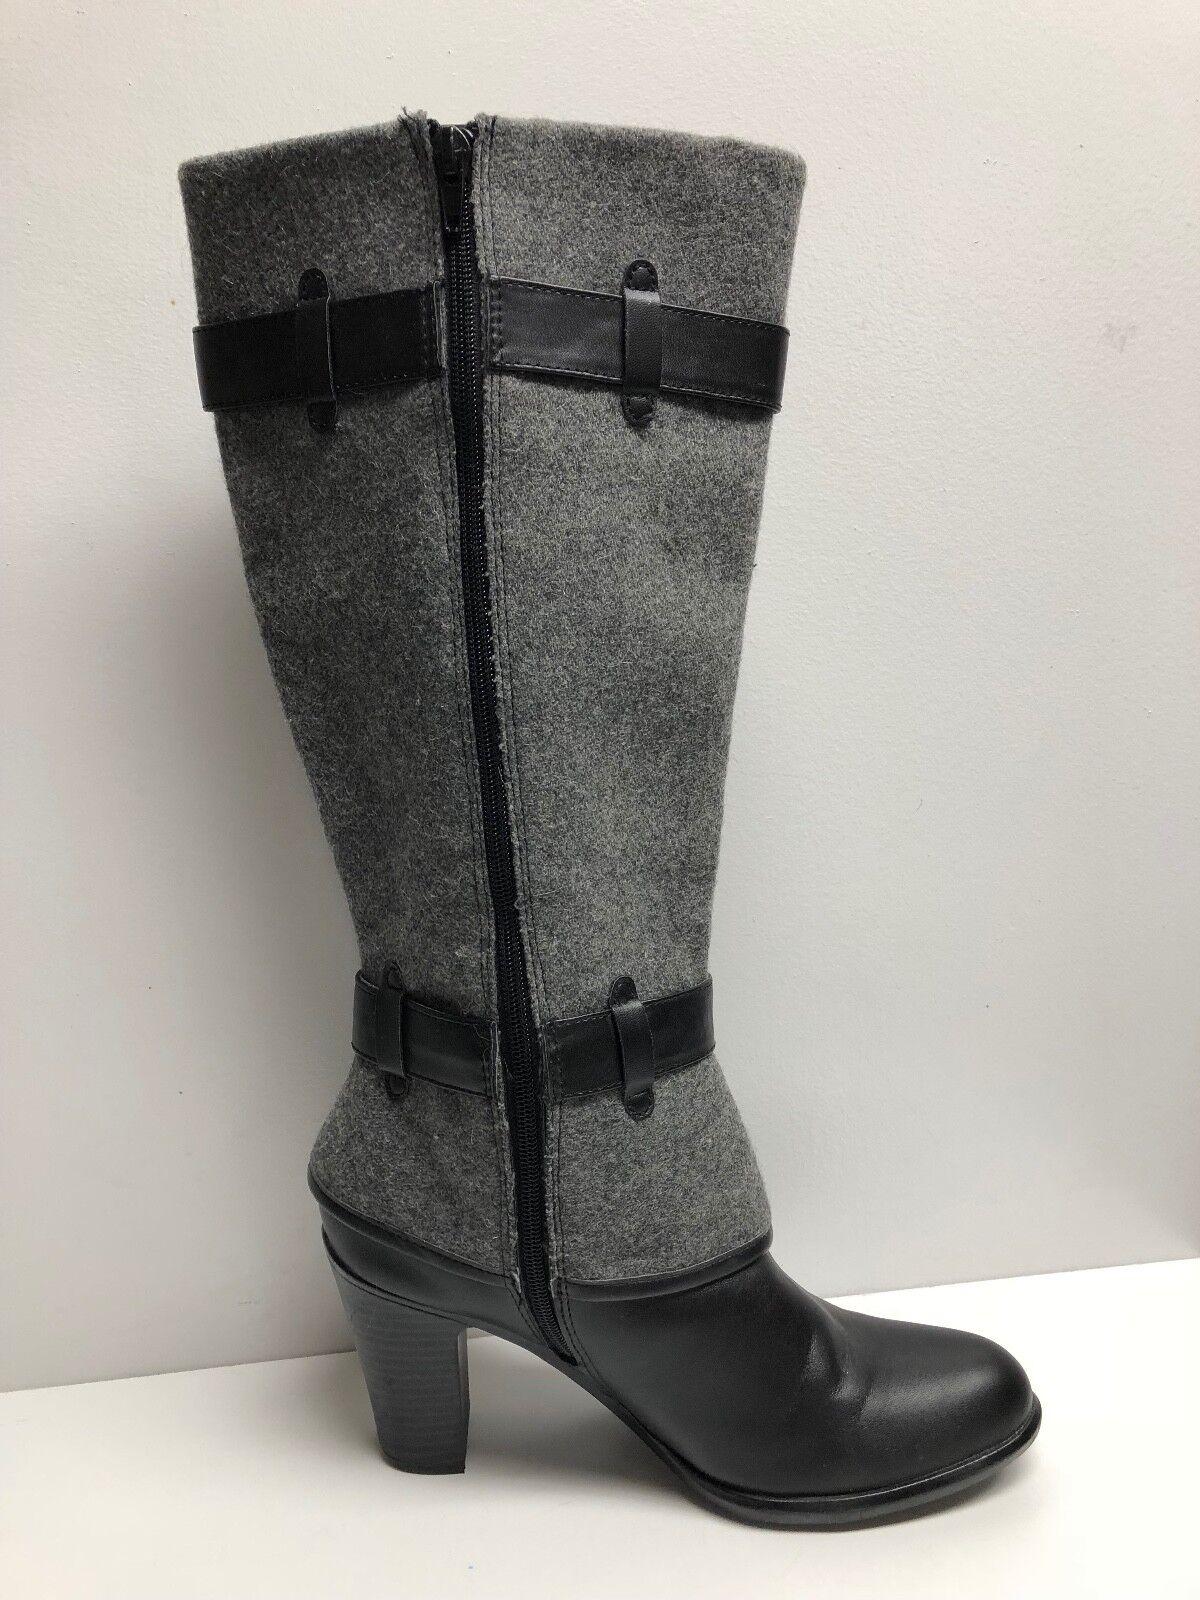 Sole Sensibility 73277 Gray Black SZ 8.5 Heels Vegan Leather Dress Boot 382343